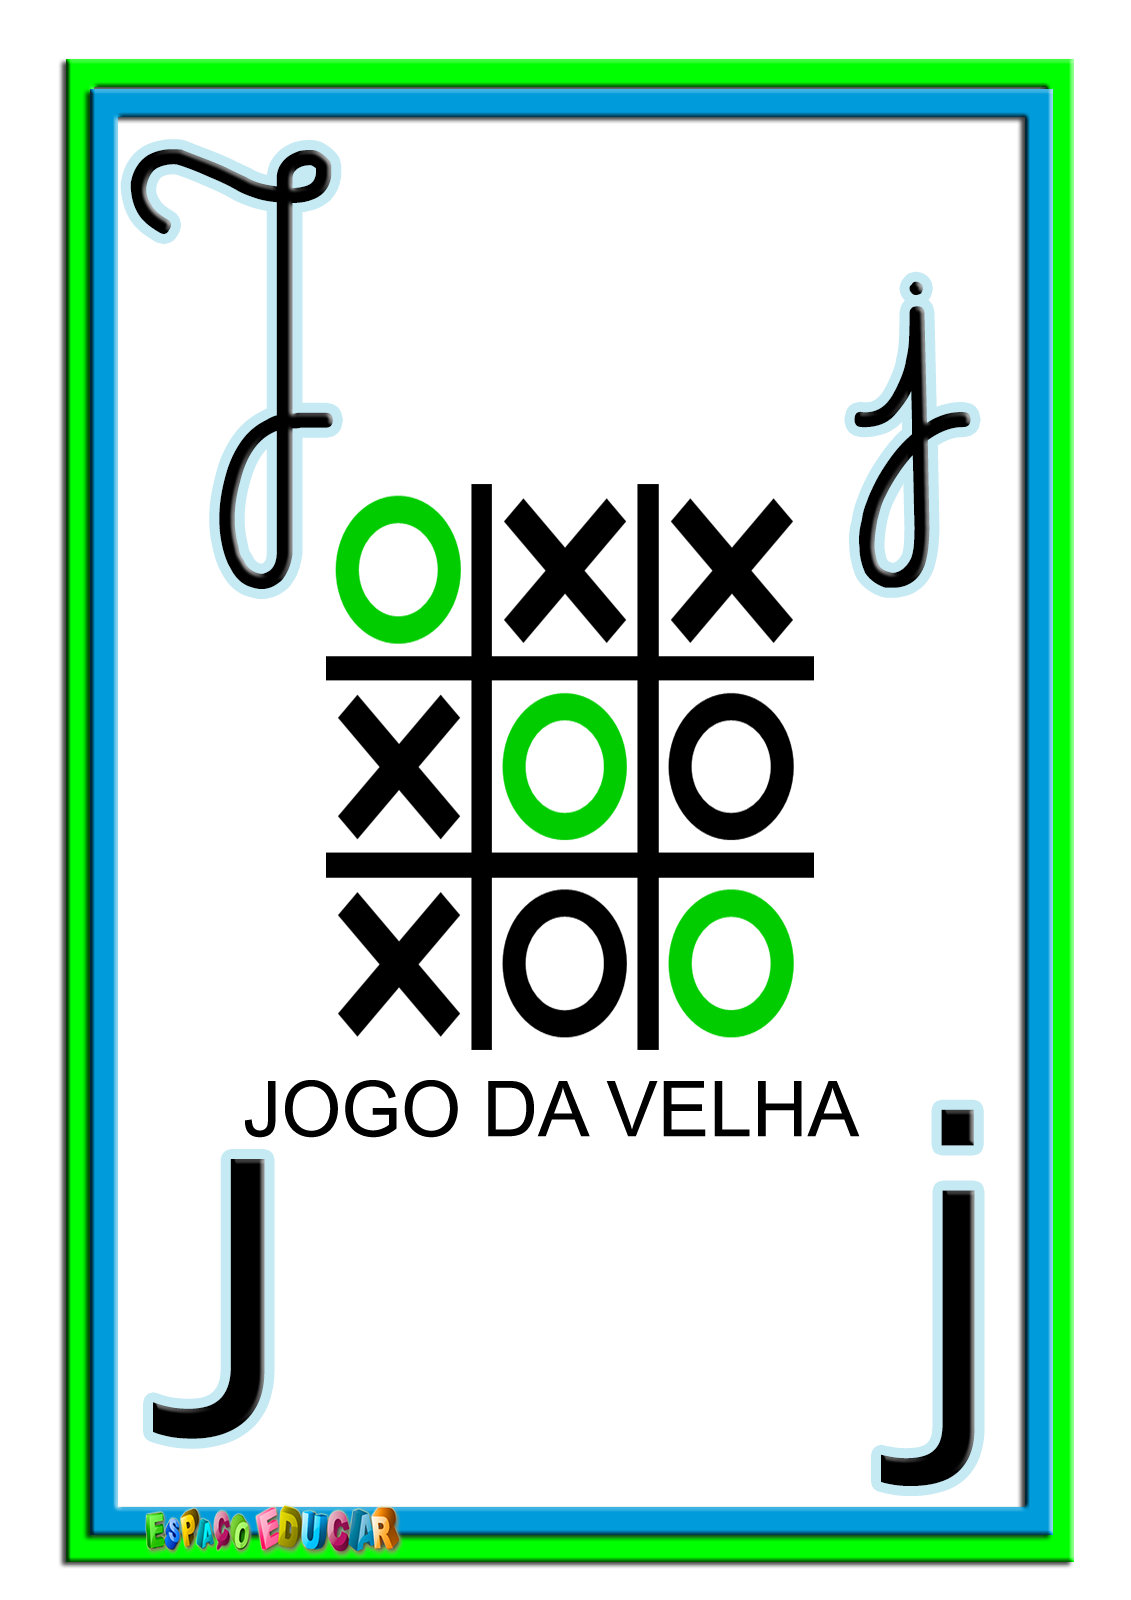 Alfabeto Ilustrado Colorido Cartazes De Parede Alfabetiza O  -> Desenhos Para Alfabeto Ilustrado